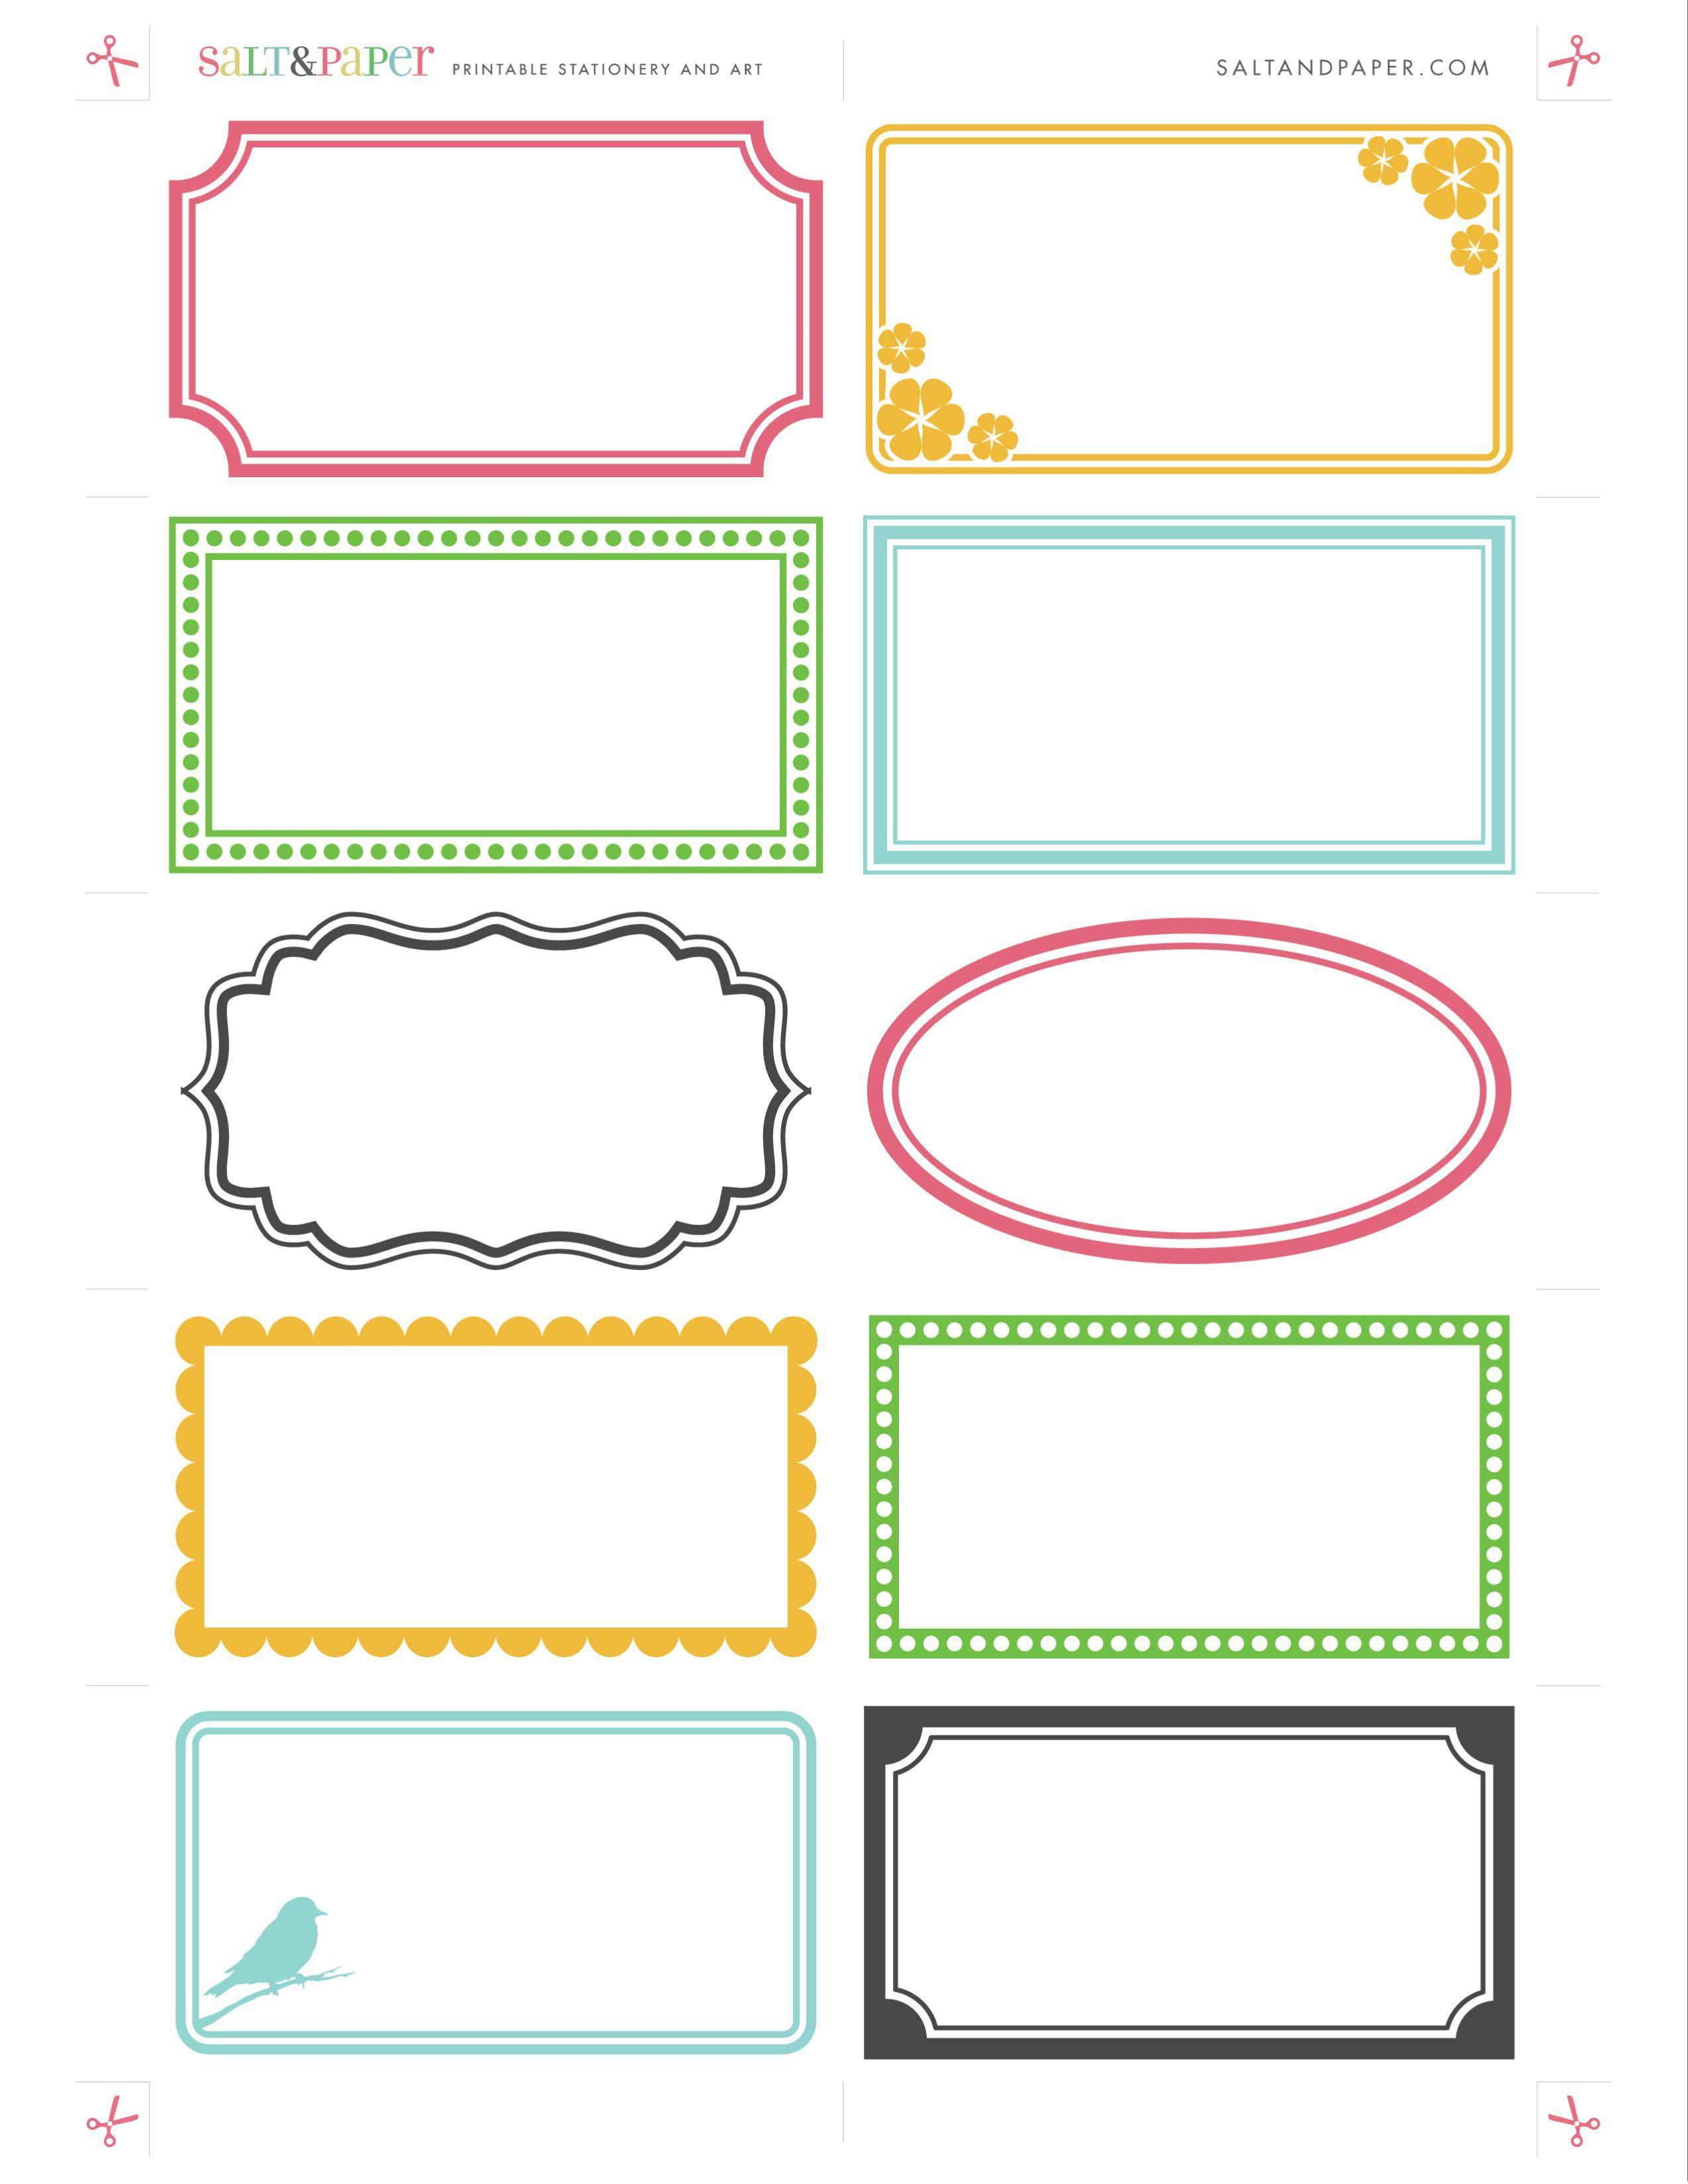 007 Impressive Free Printable Busines Template Image  Templates Card For Google Doc Budget Microsoft WordFull